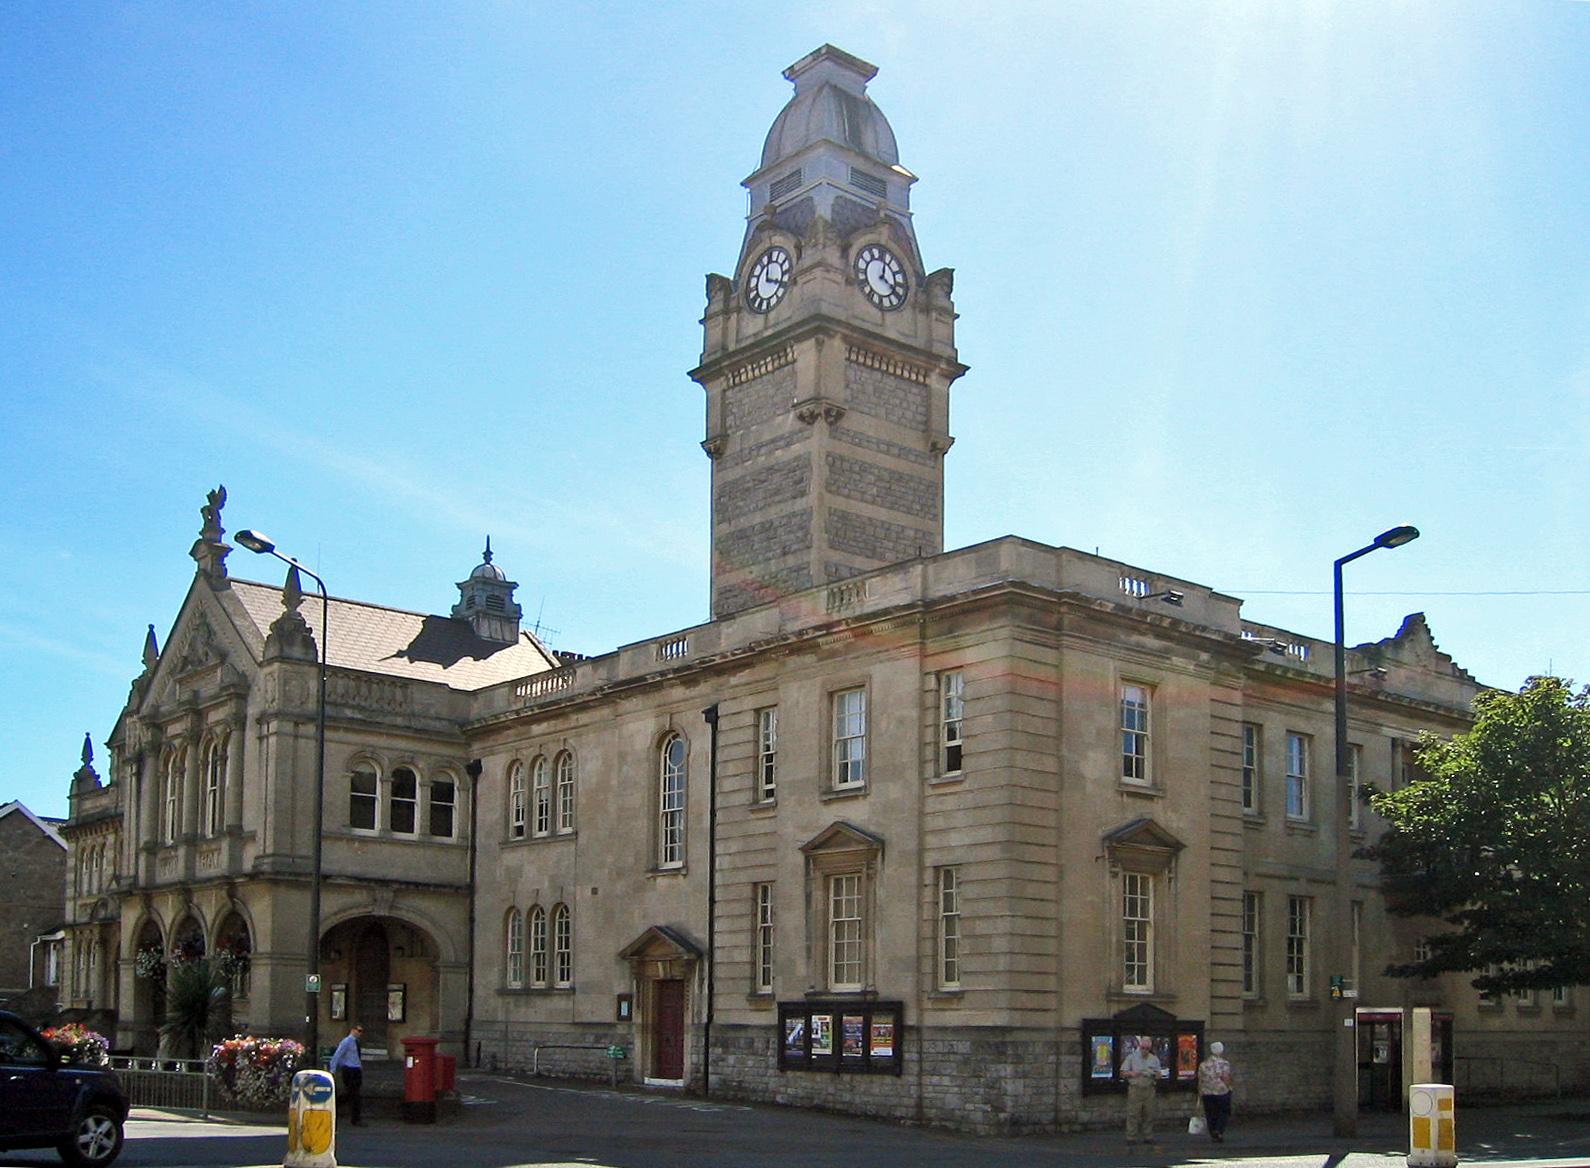 congleton-town-hall.jpg